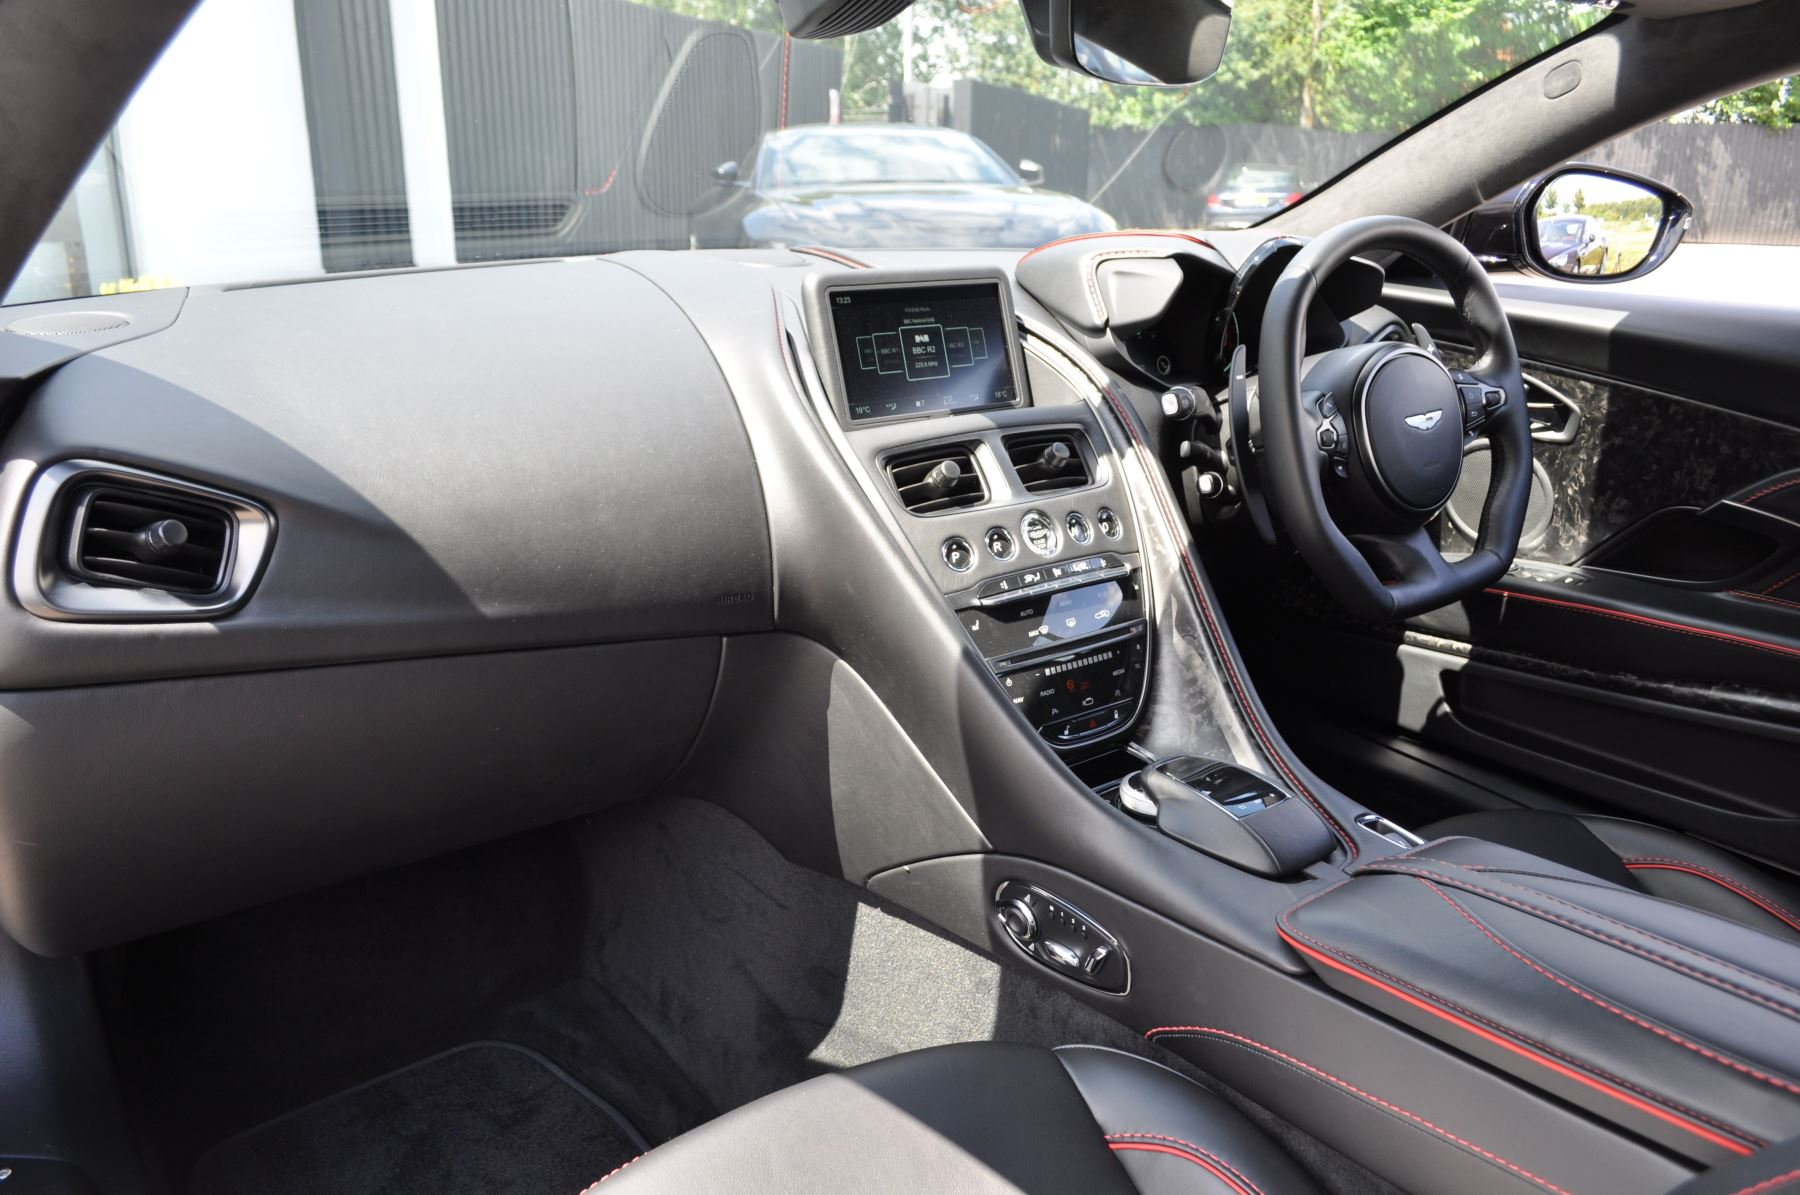 Aston Martin DBS V12 Superleggera Touchtronic image 10